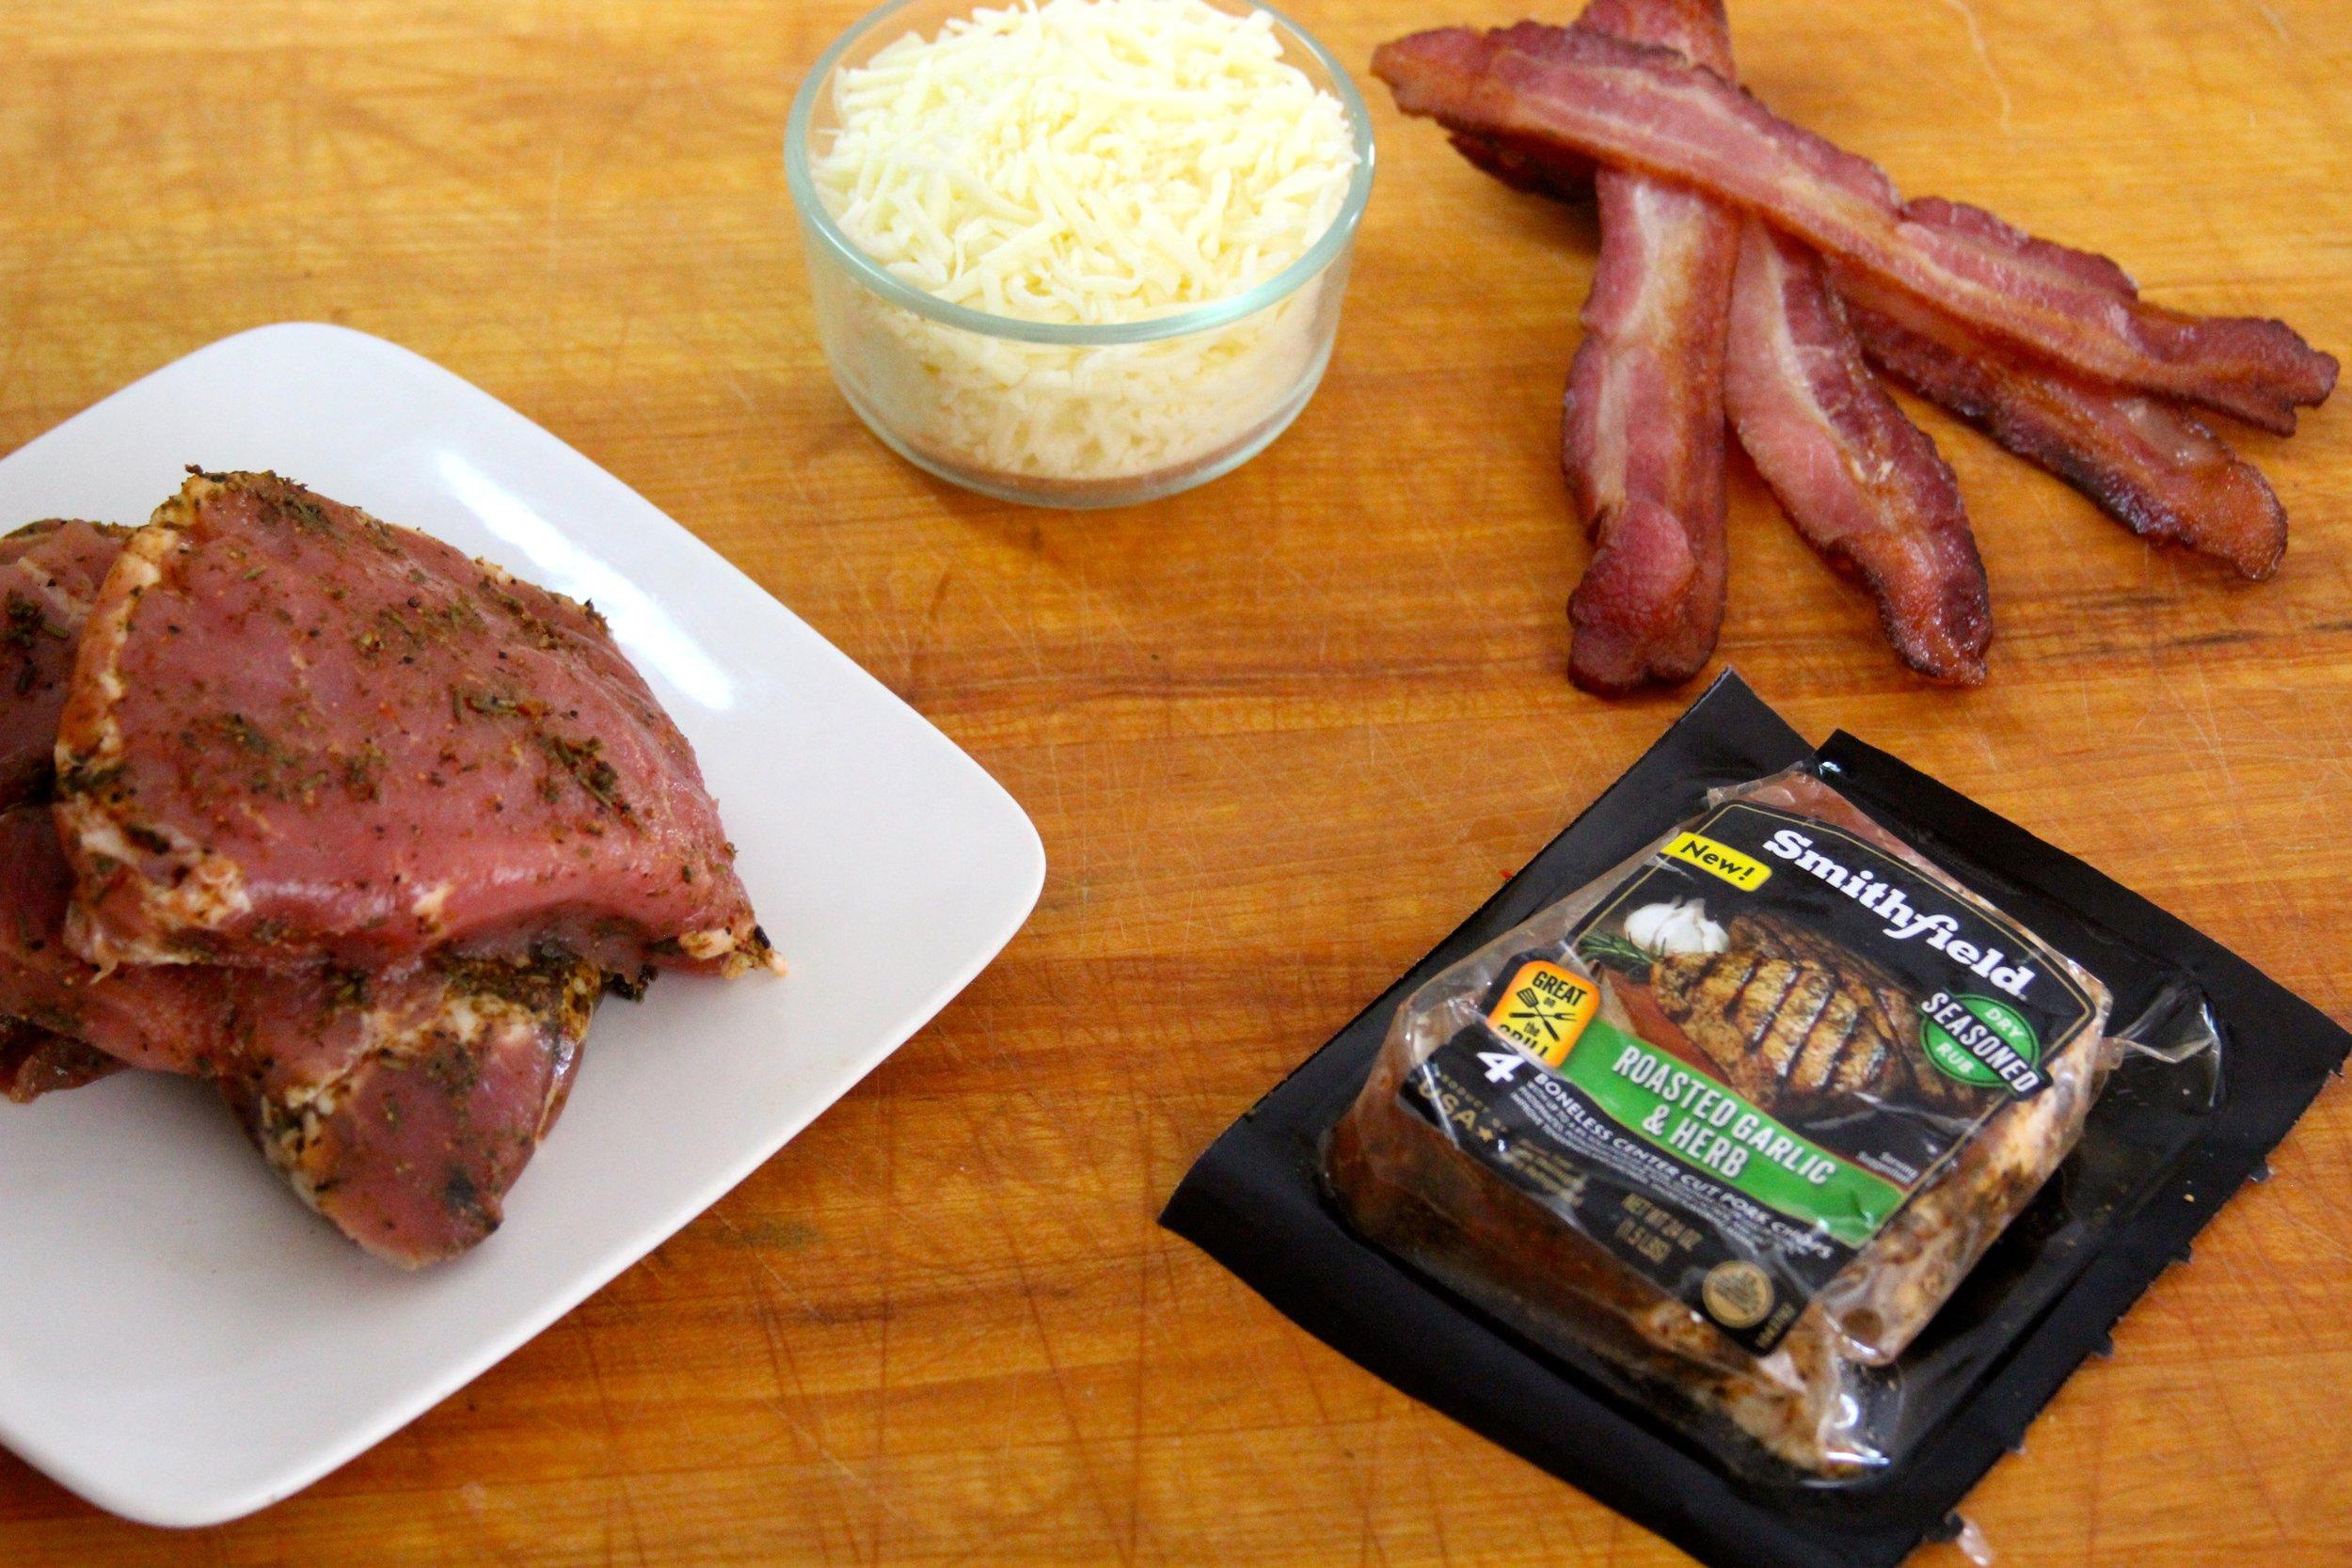 Smithfield Marinated Pork Chop, Mozzarella, and Bacon